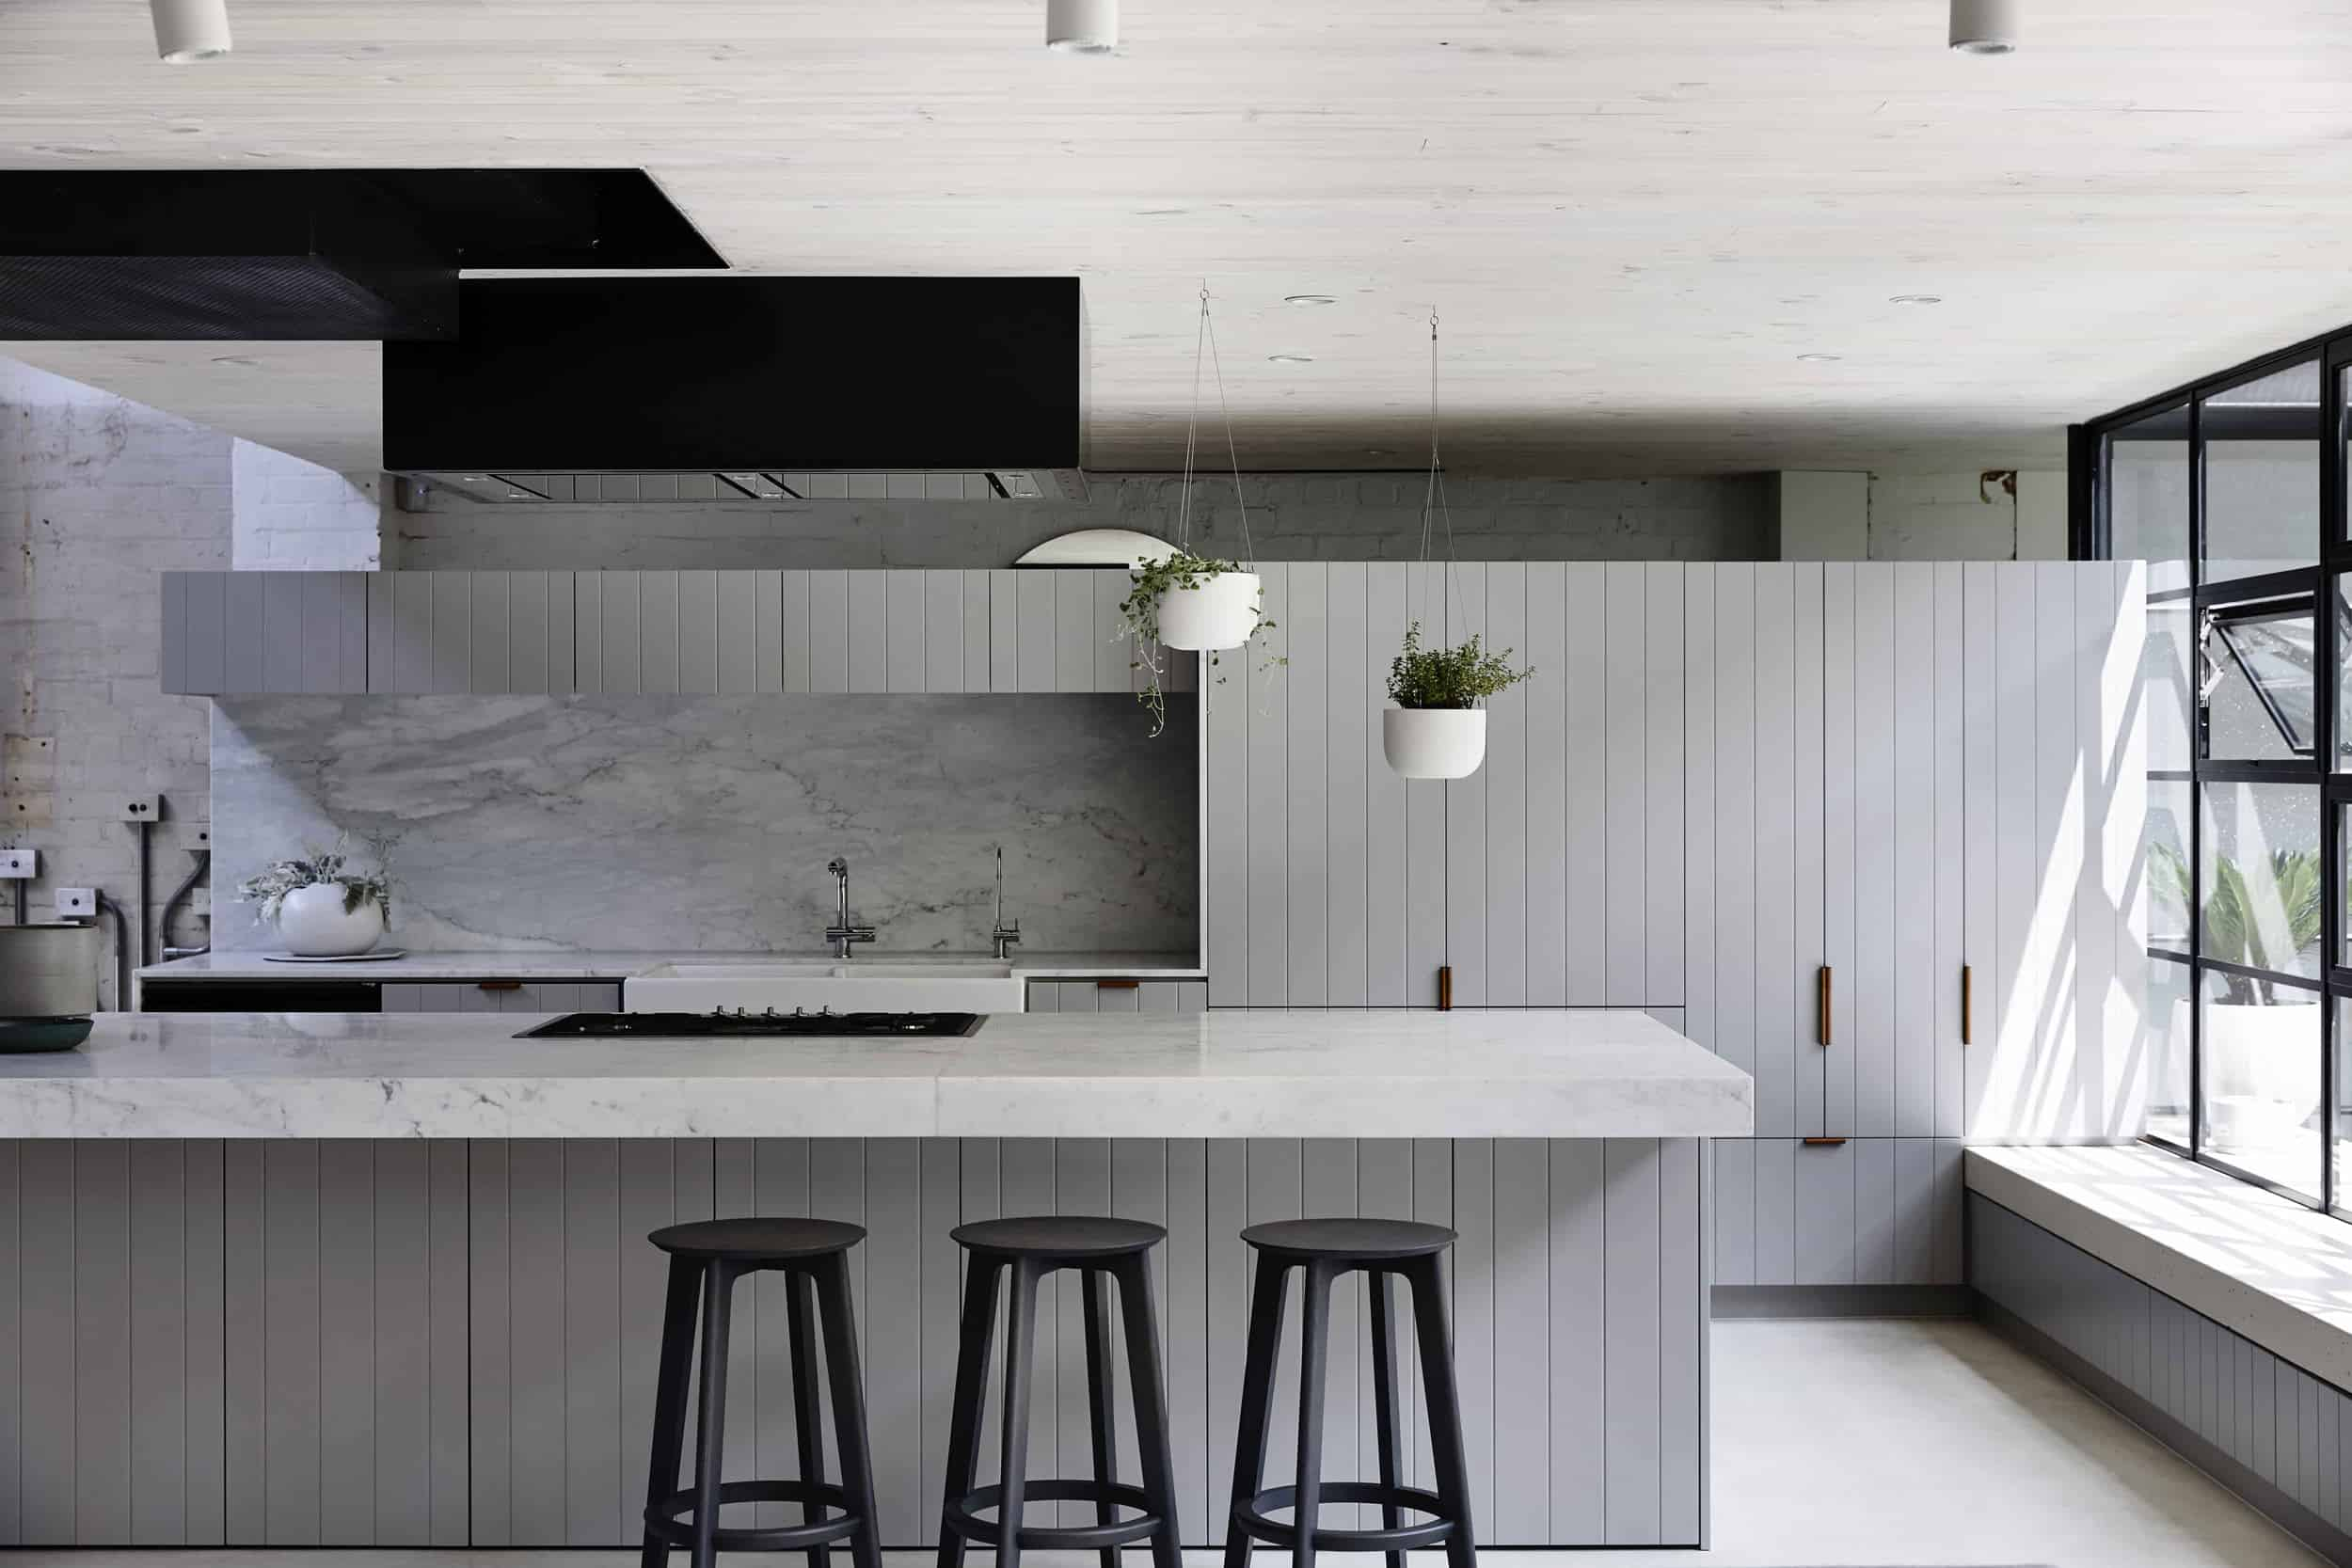 Emily Henderson Mountain Fixer Upper Kitchen I Design You Decide Inspo Pic 3